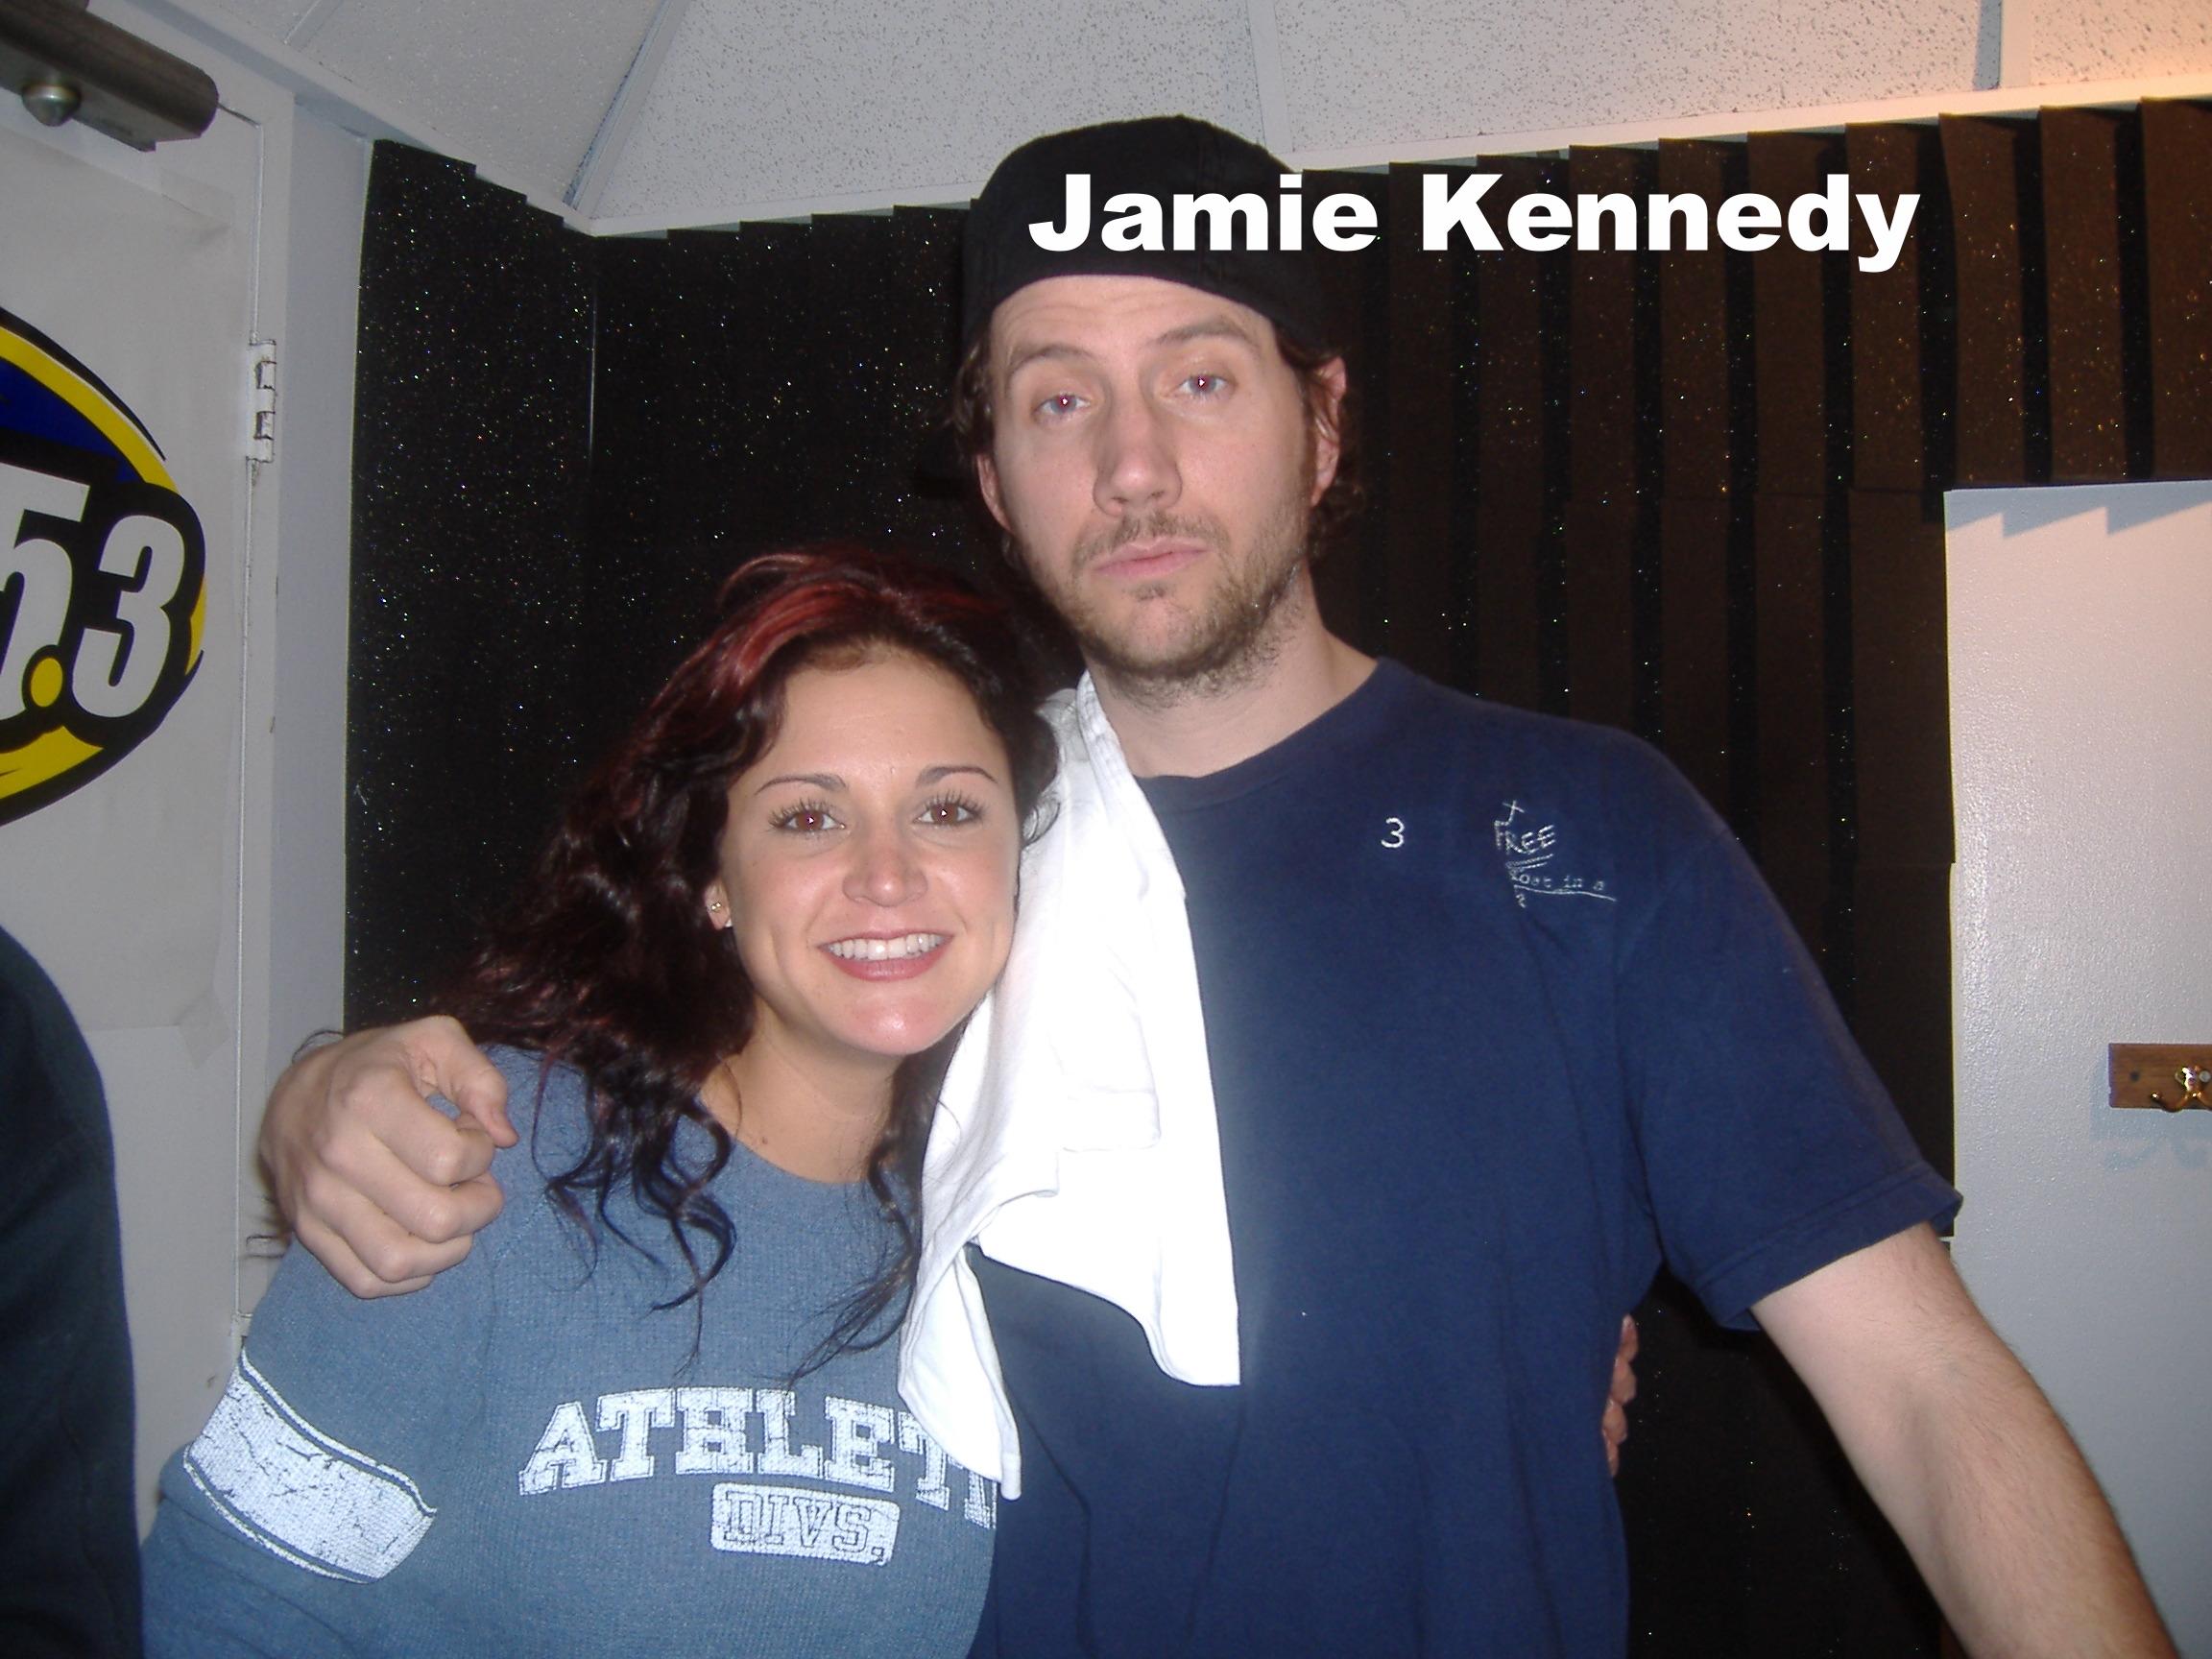 JamieKennedy 002.jpg